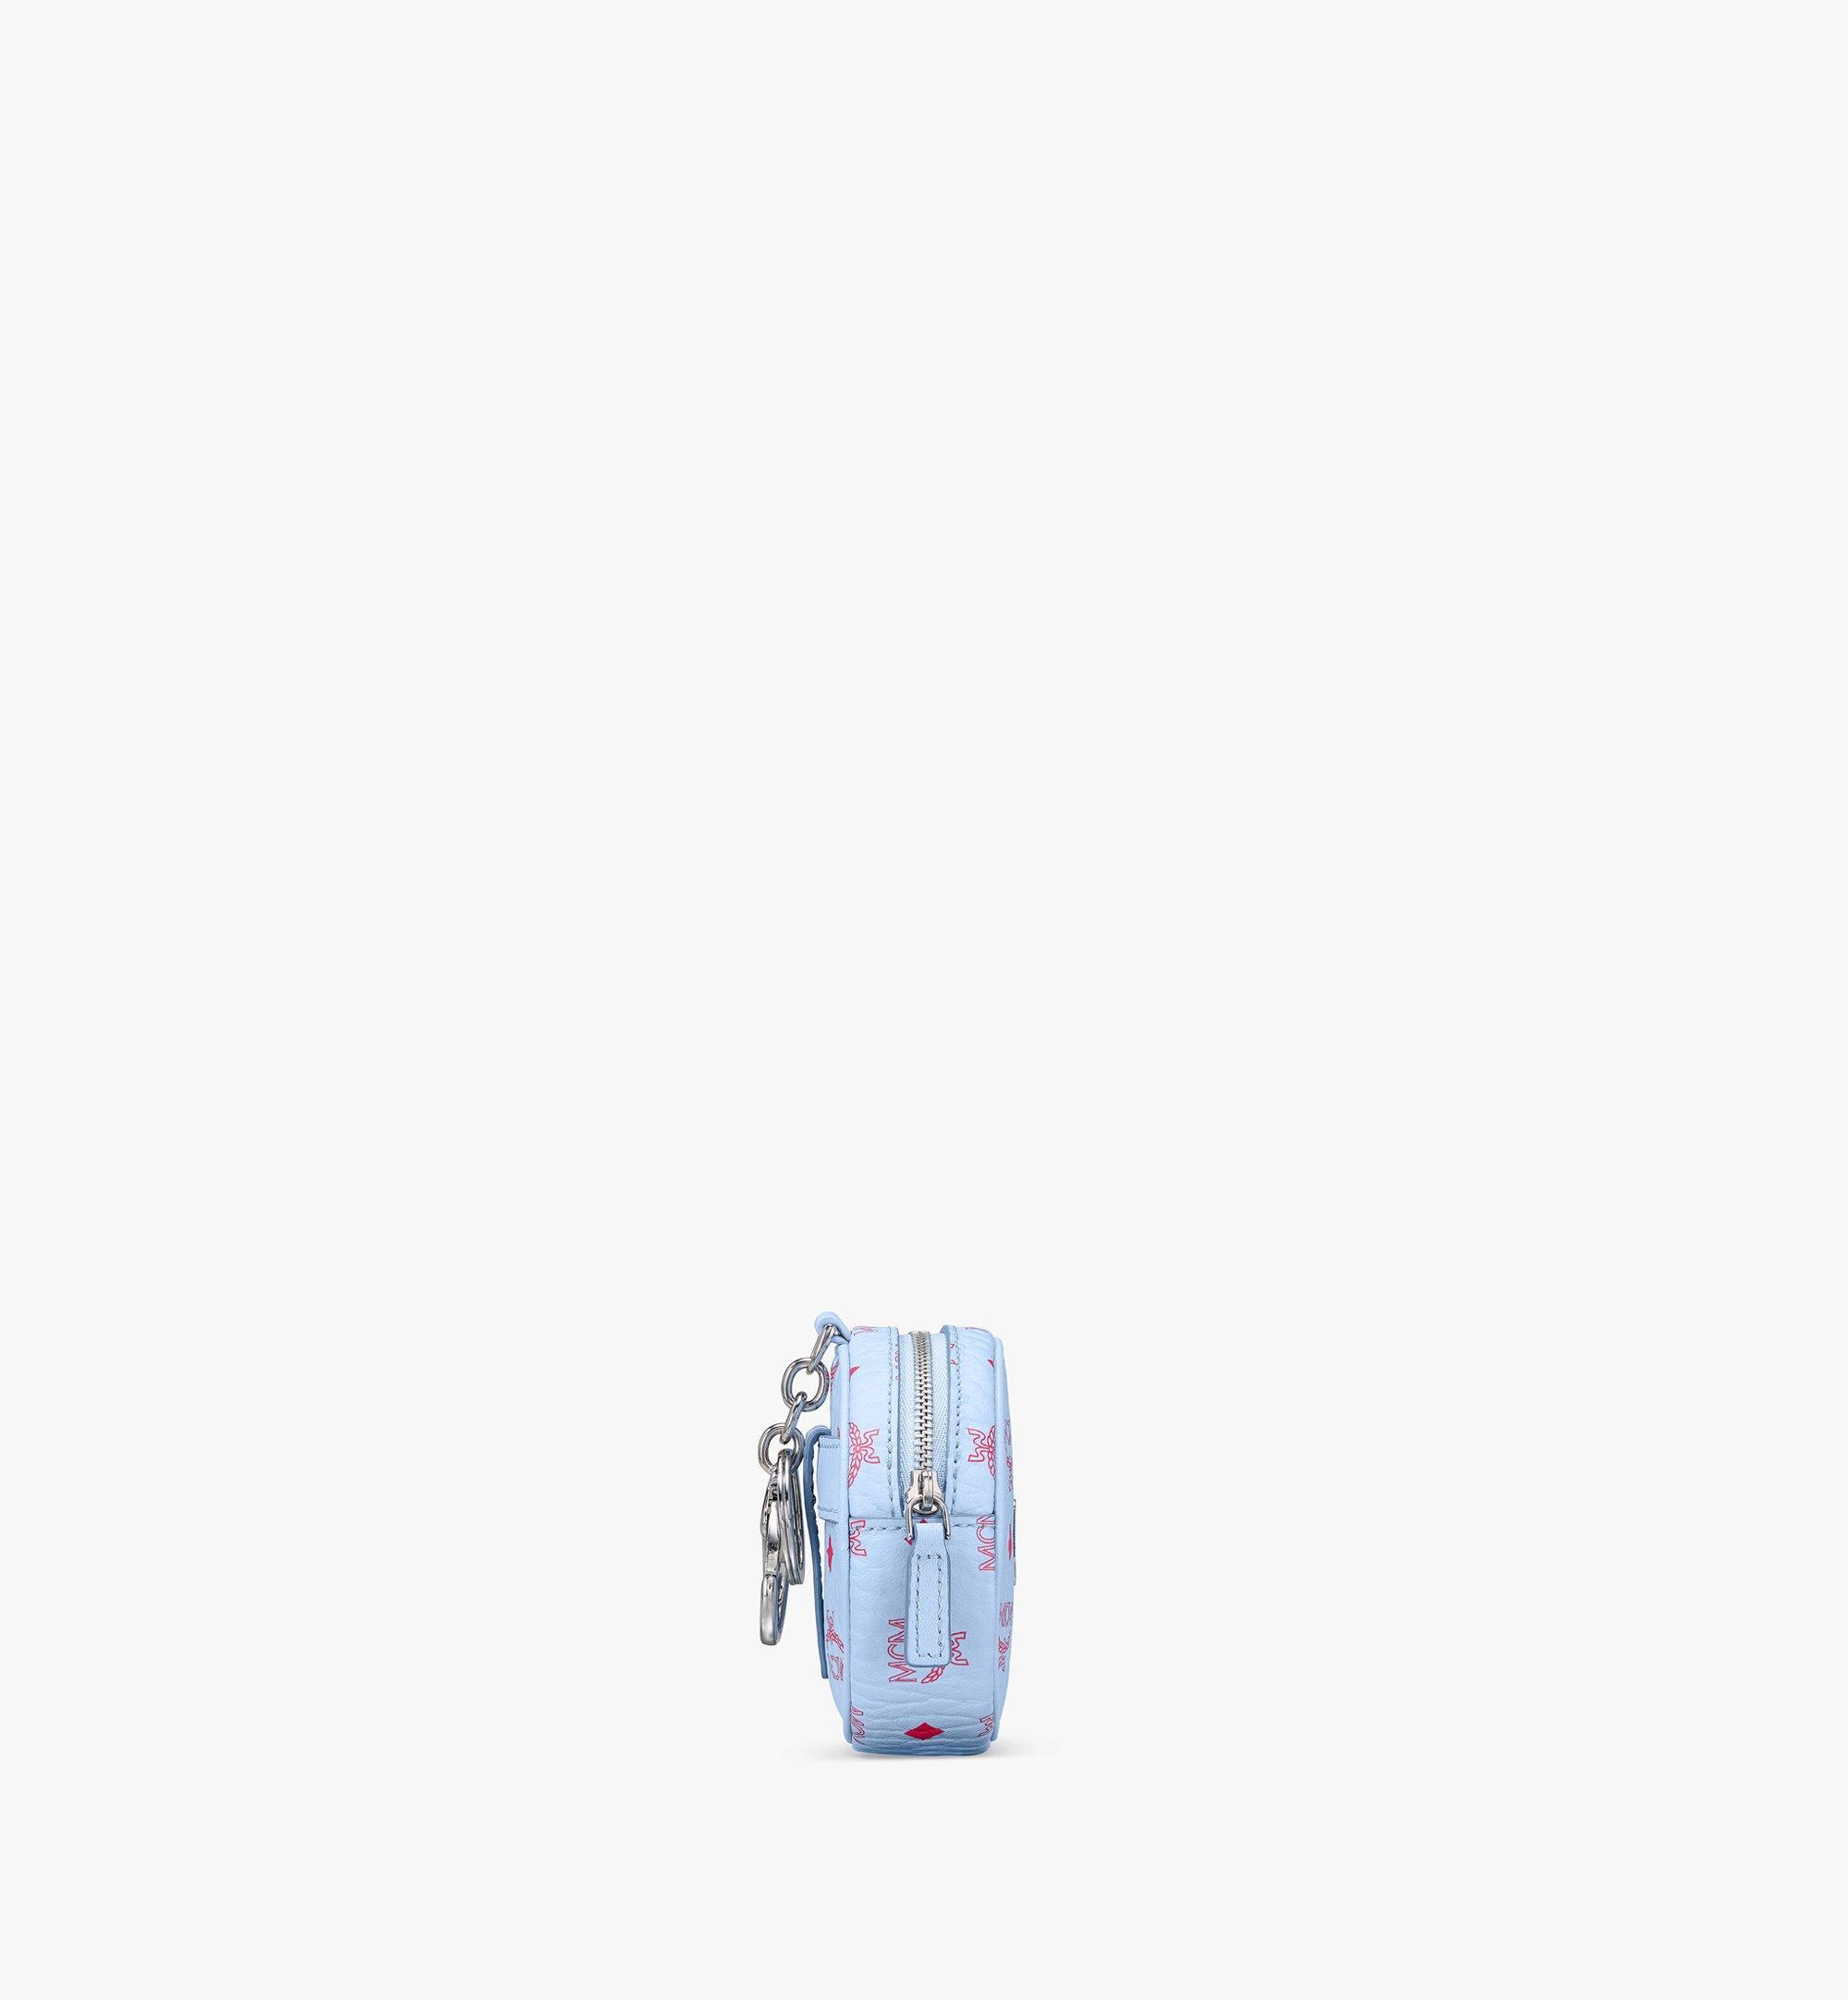 MCM タンバリンバッグ チャーム - ヴィセトス、クロスボディストラップ付き Blue MXZASVI03H2001 Alternate View 2